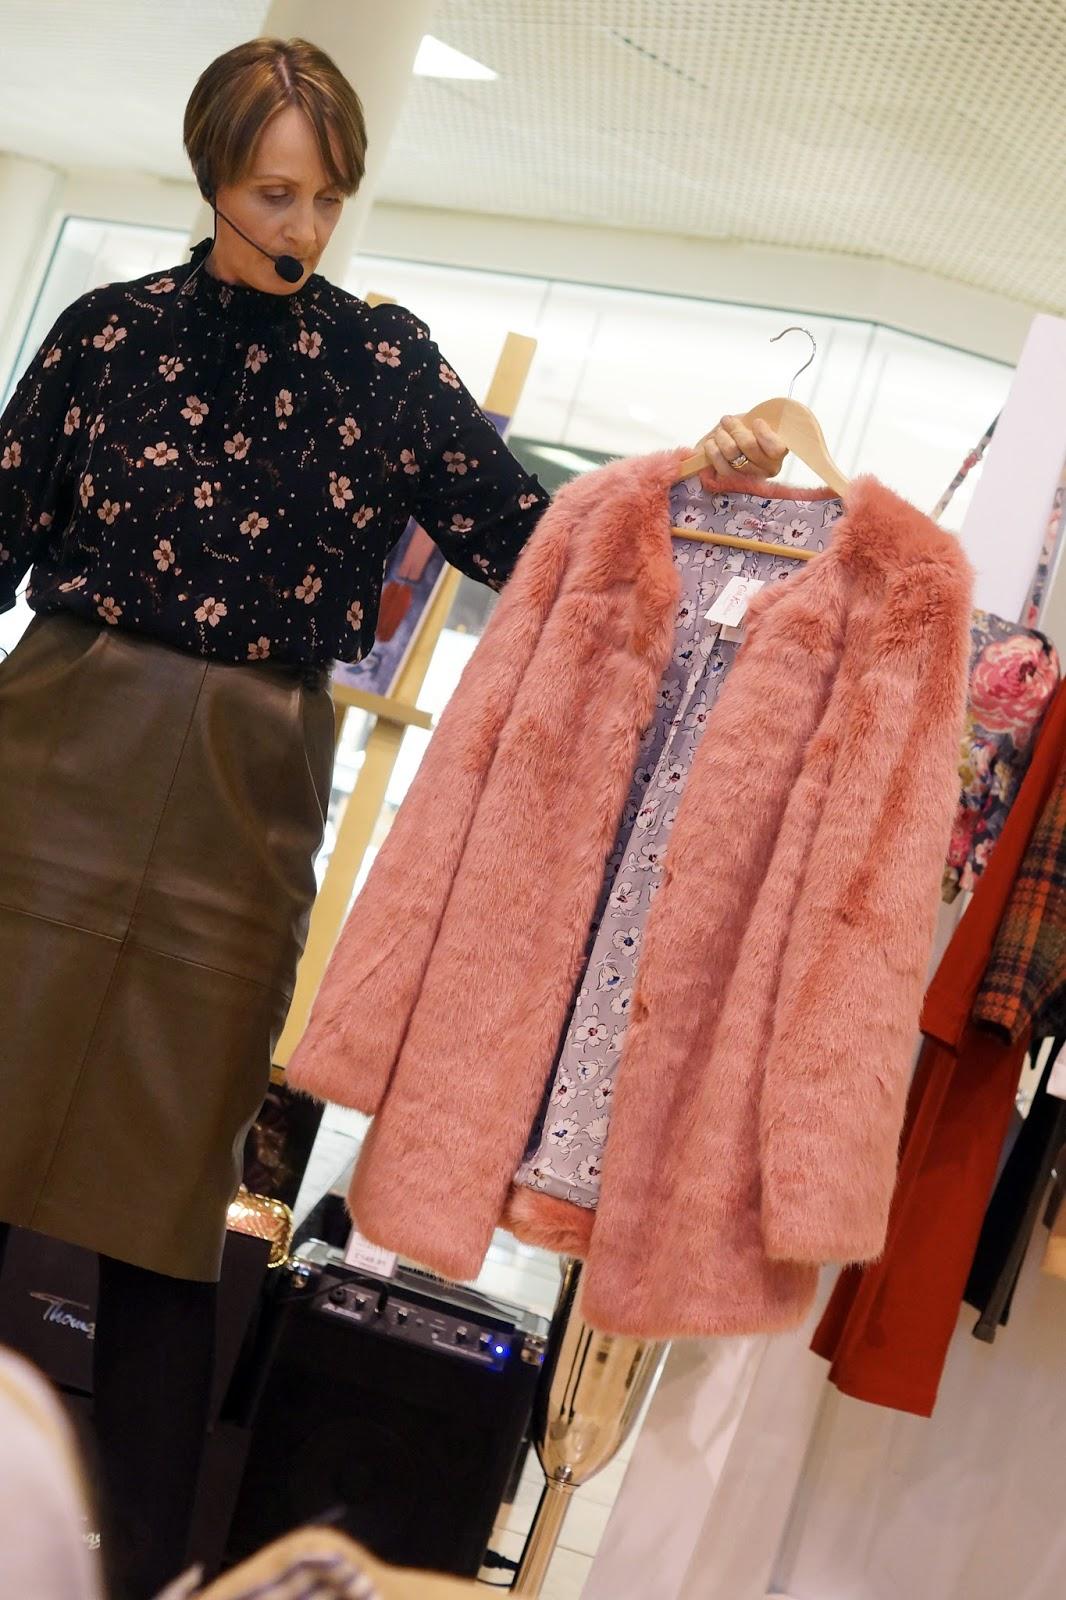 AW16 Style Intu Metrocentre Seasonal Trends North East Bloggers Cath Kidston Fur